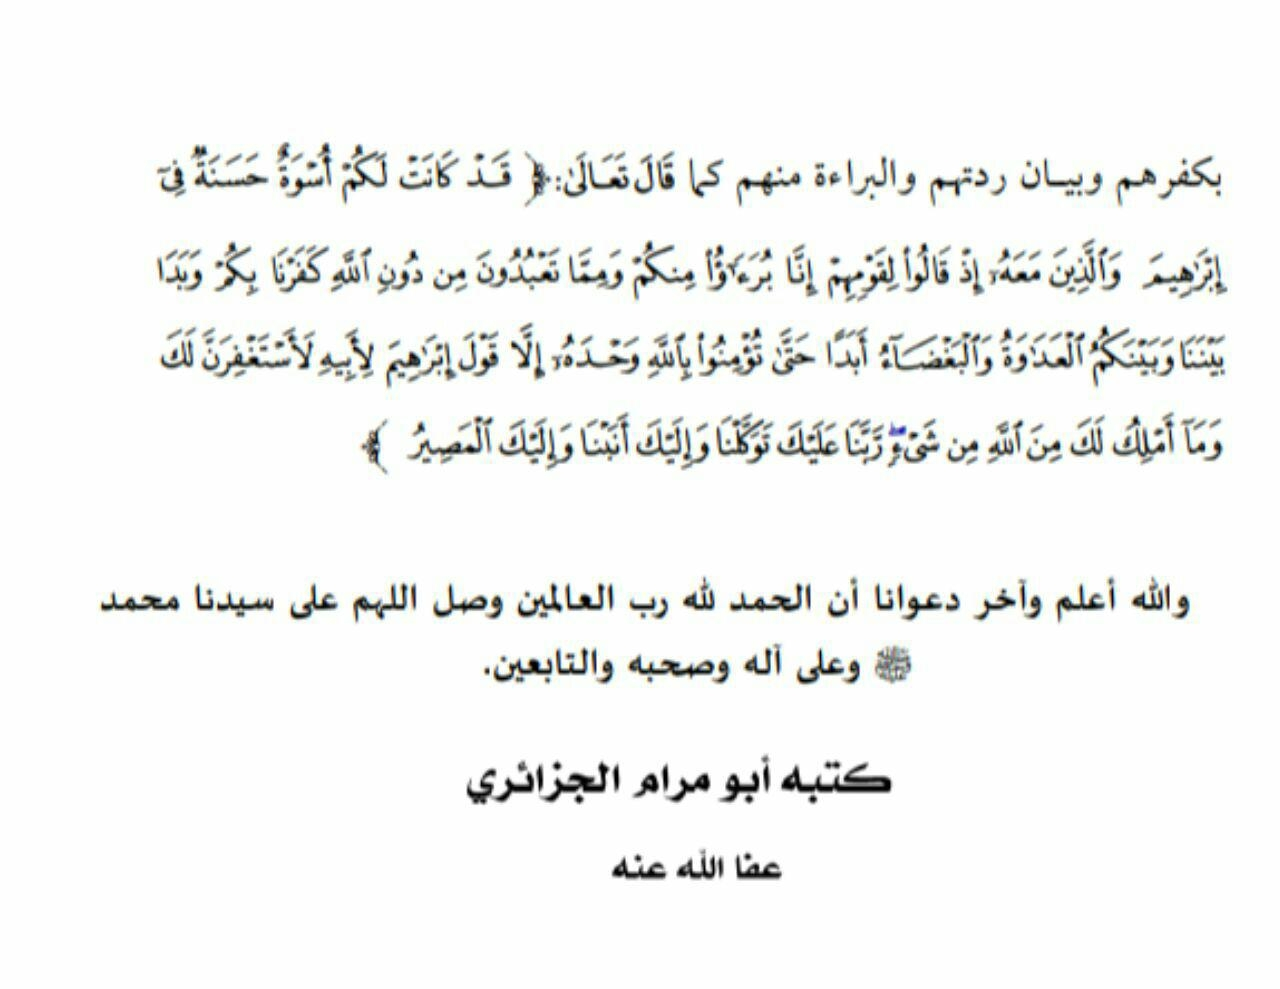 The Hamas-Islamic State Sinai Relationship: Translation and Analysis